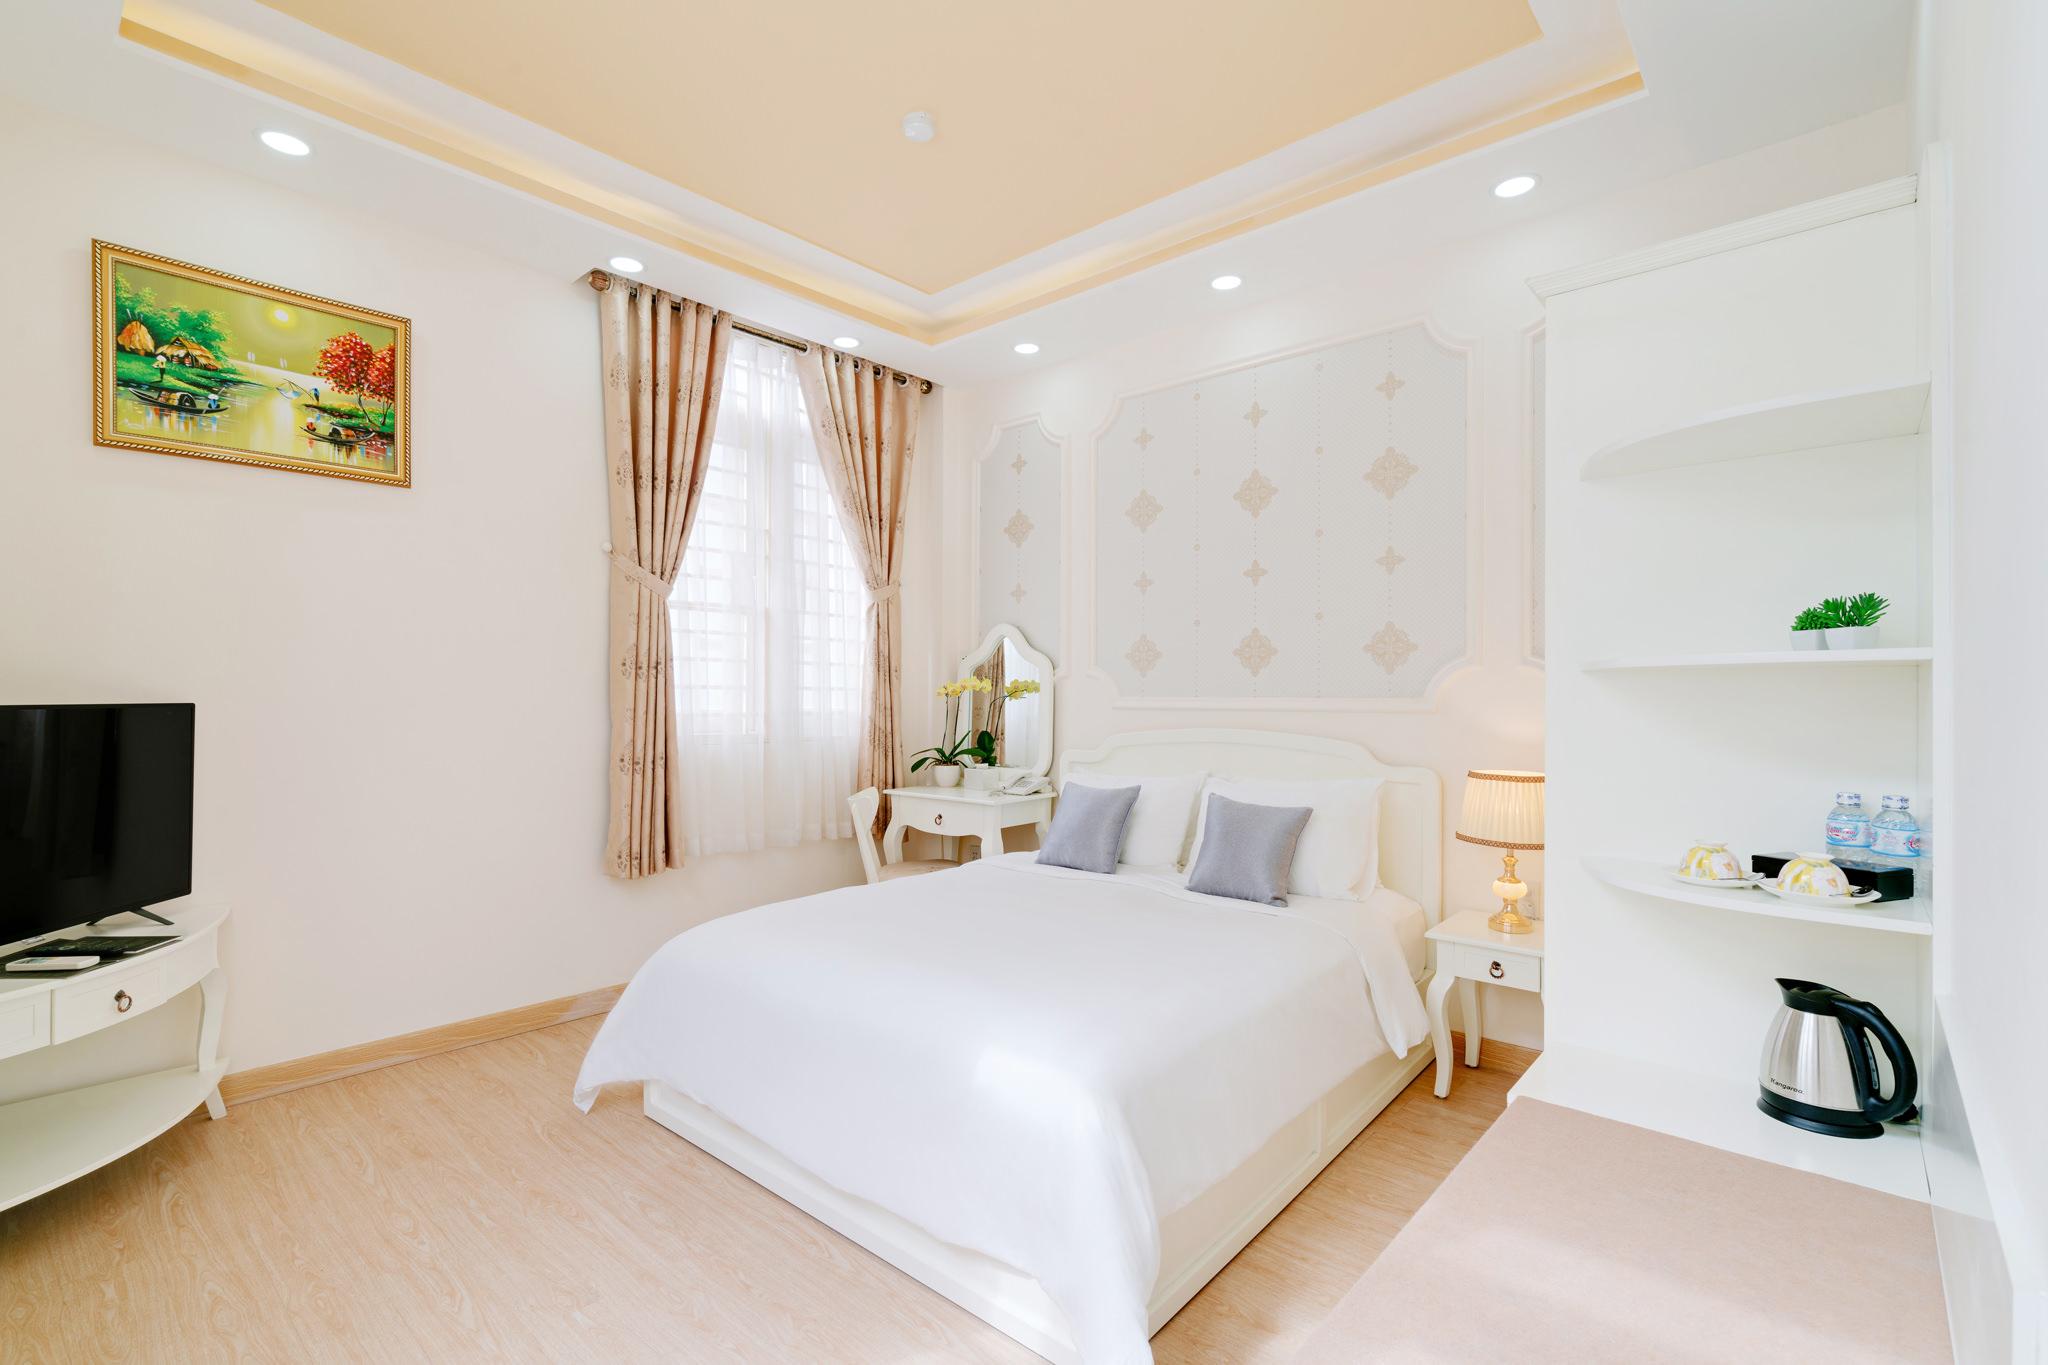 20180529 - Chez Mimosa - Interior - Hotel - 001.jpg